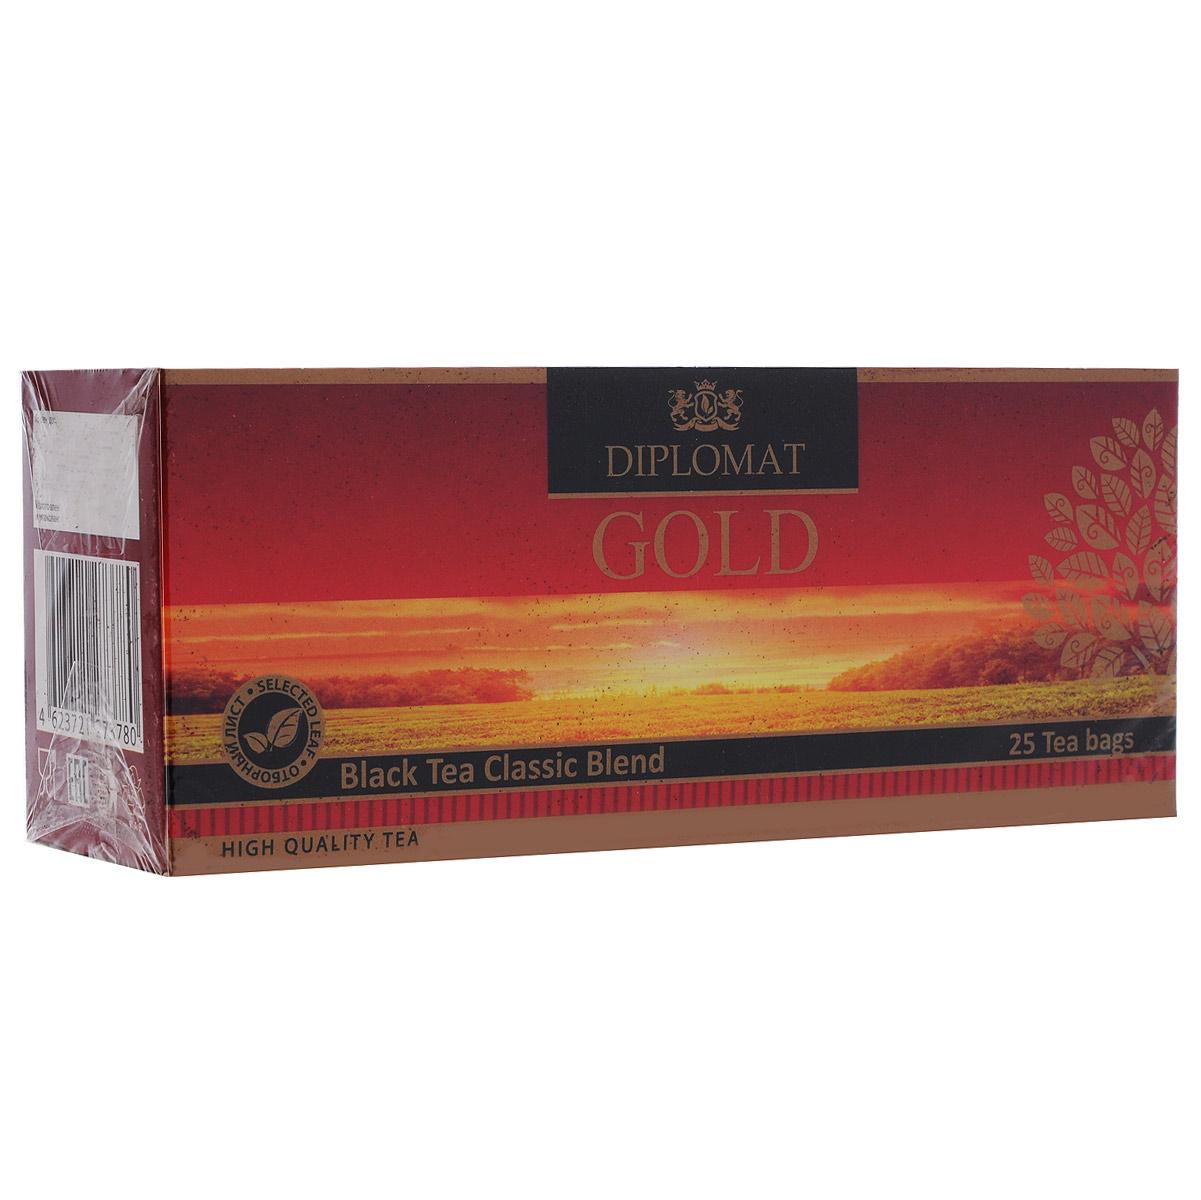 Diplomat Black Tea Classic Blend черный чай в пакетиках, 25 шт.